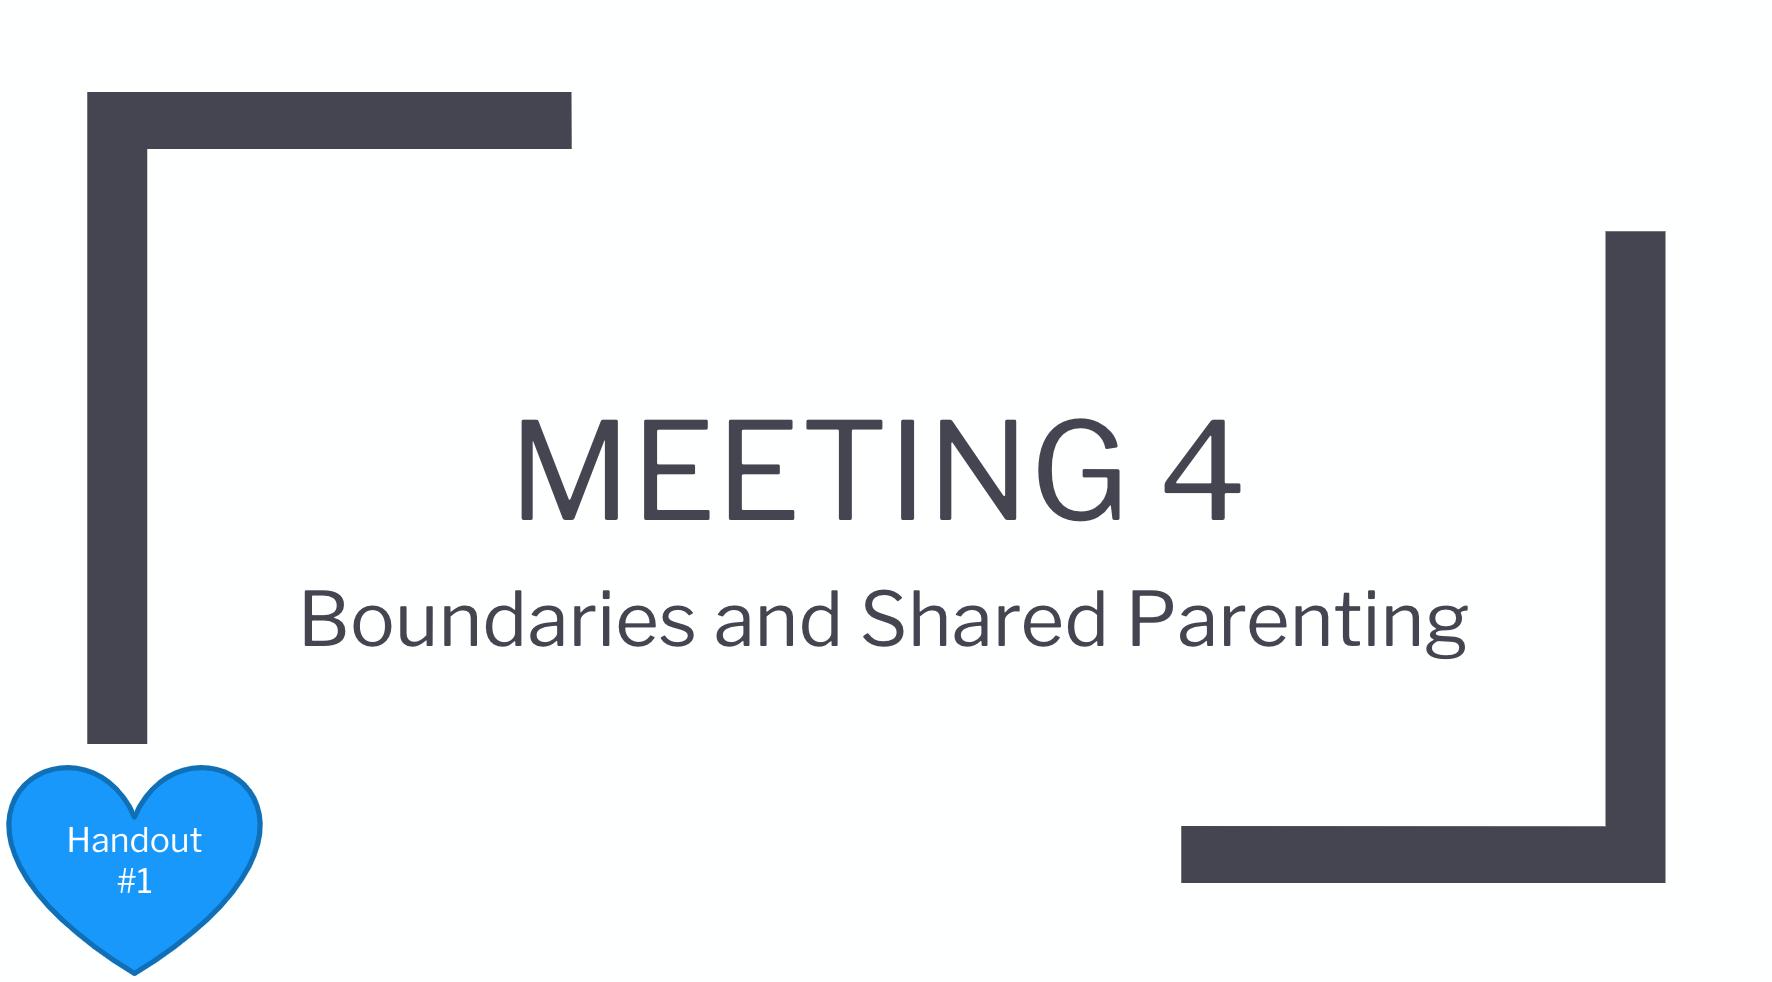 Meeting 4 Boundaries Shared Parenting